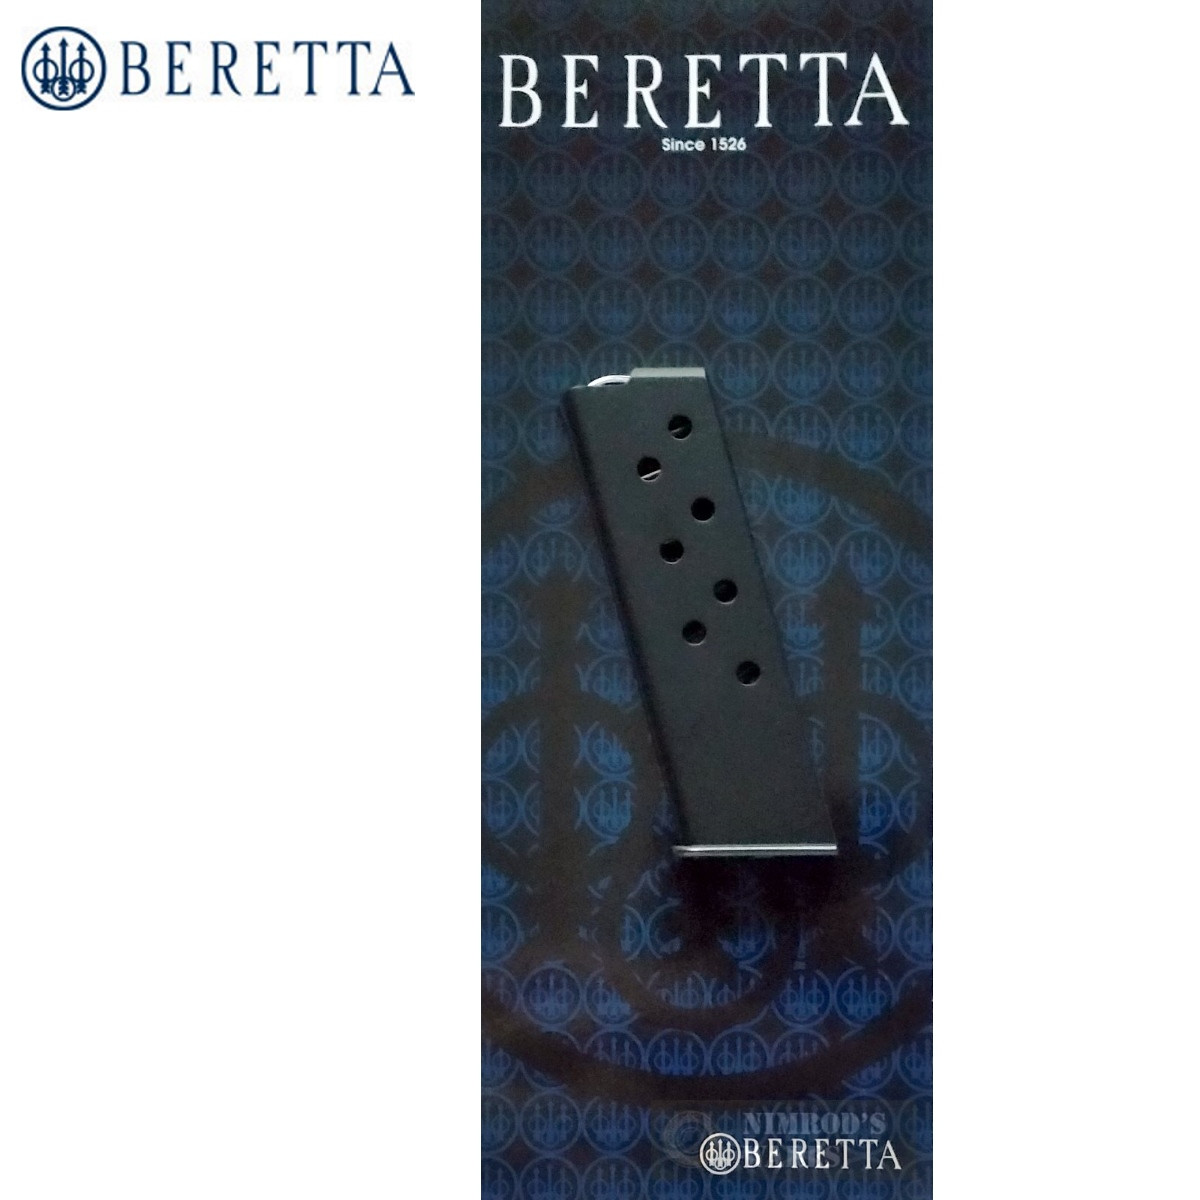 BERETTA Model 21 BOBCAT  25 ACP 8 Round MAGAZINE JM25